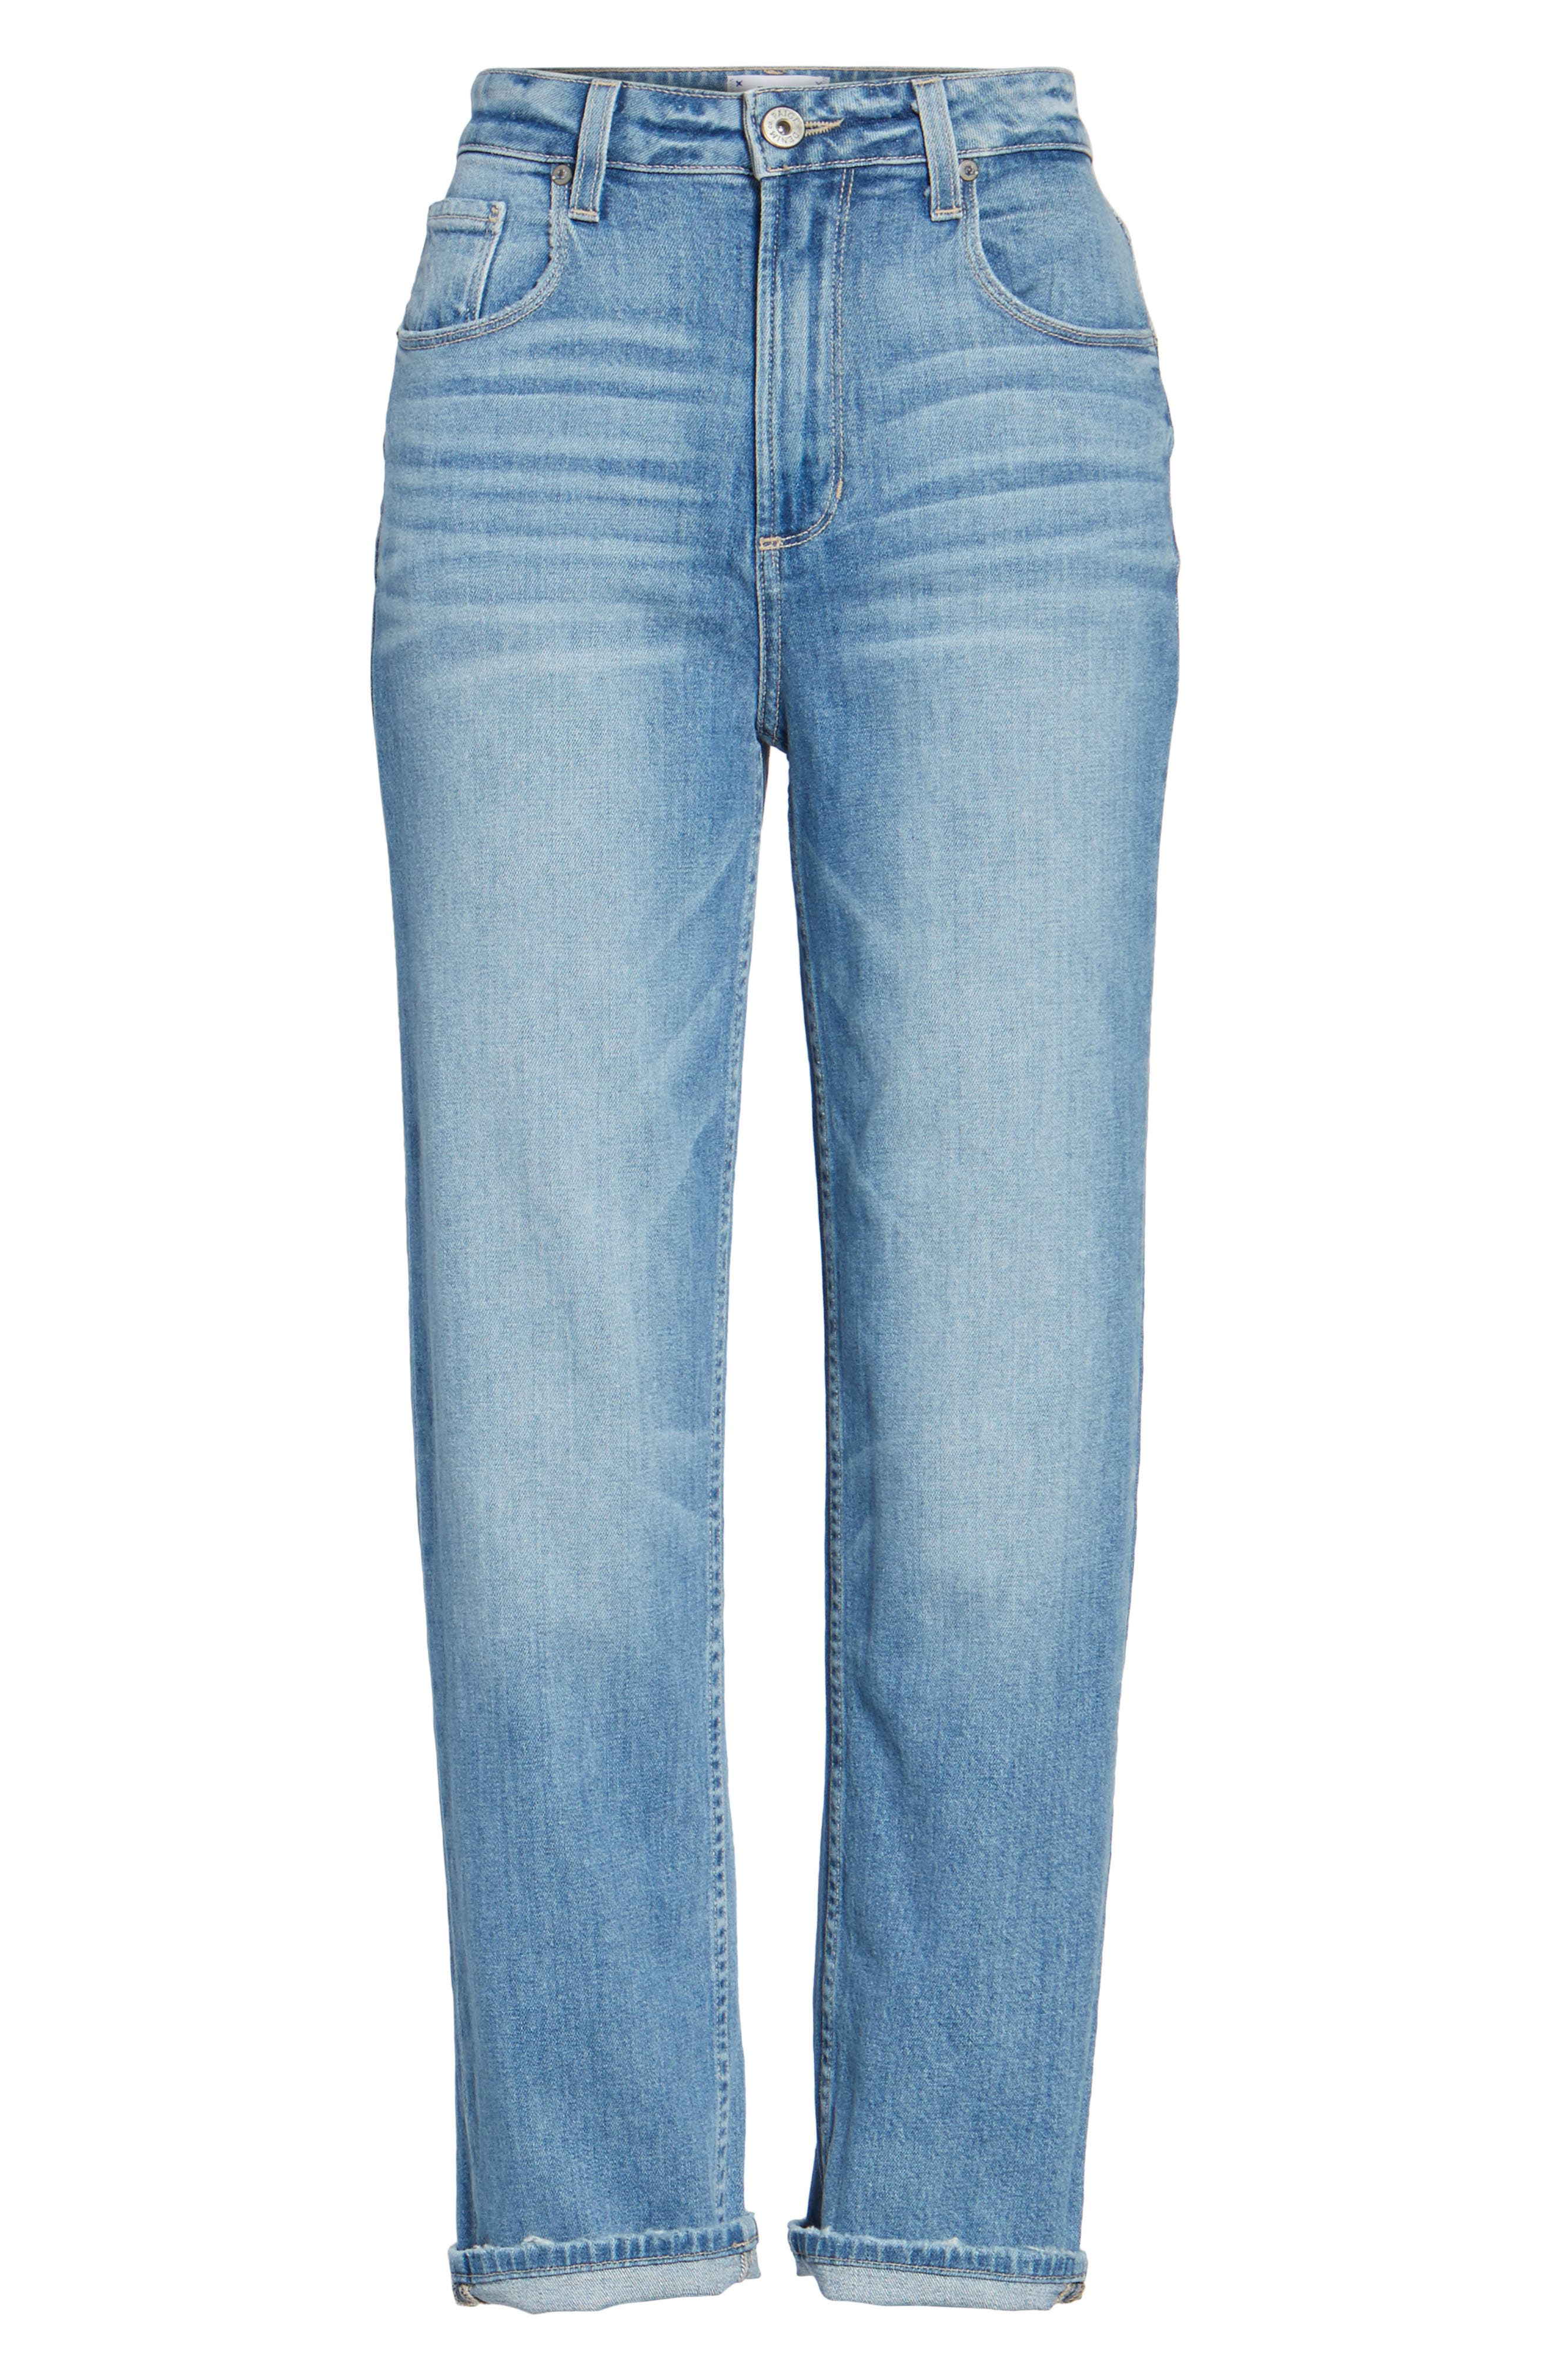 Sarah High Waist Crop Straight Leg Jeans,                             Alternate thumbnail 7, color,                             400